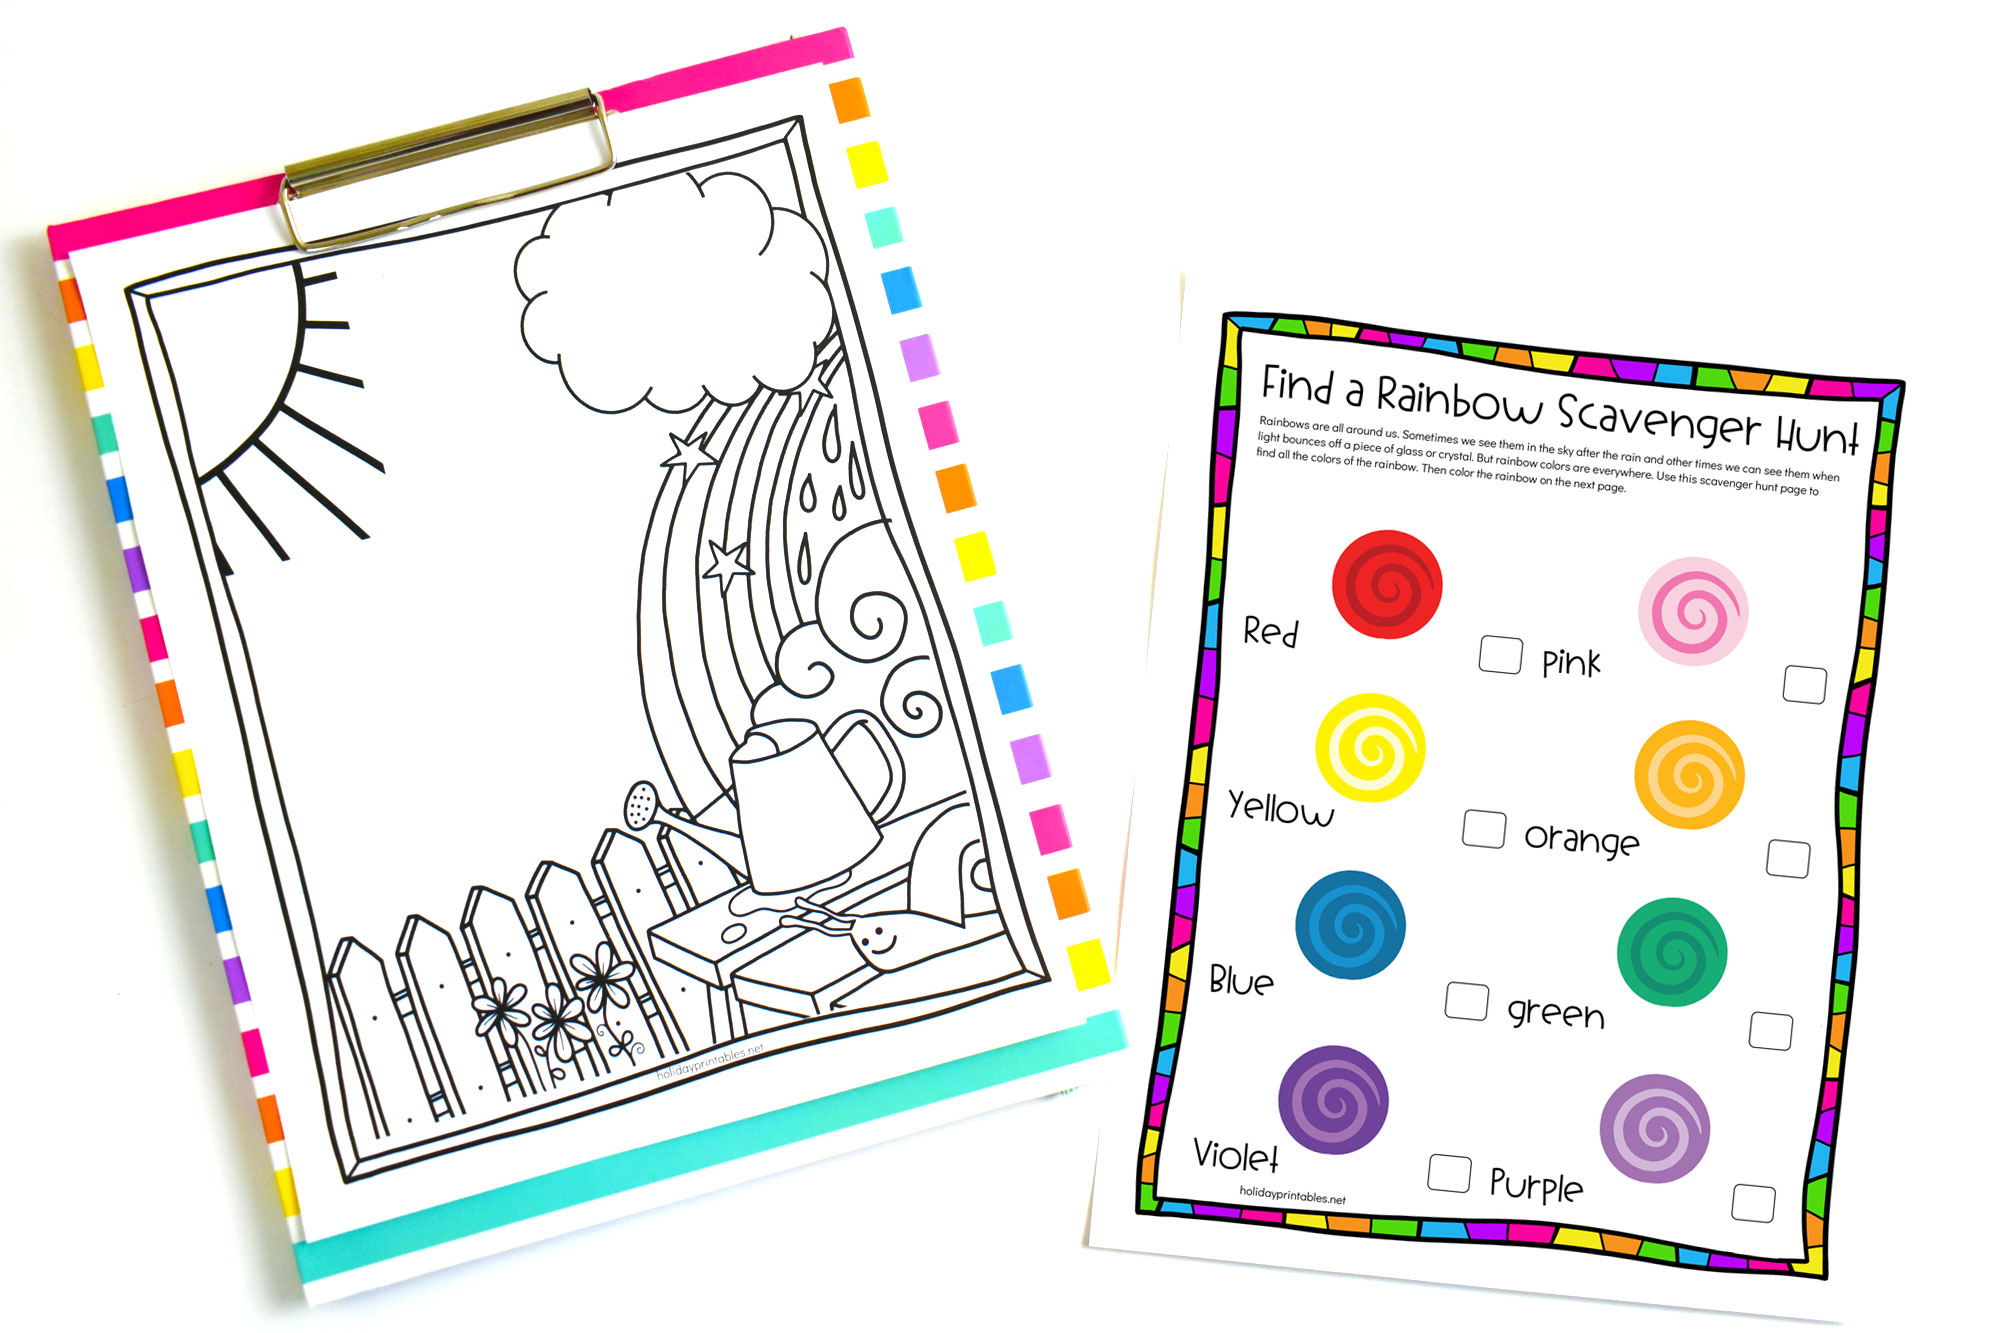 Rainbow Colors Scavenger Hunt | HolidayPrintables.net #printables #rainbows #findarainbow #scavengerhunt #printablegames #weloveprintables #holidayprintables